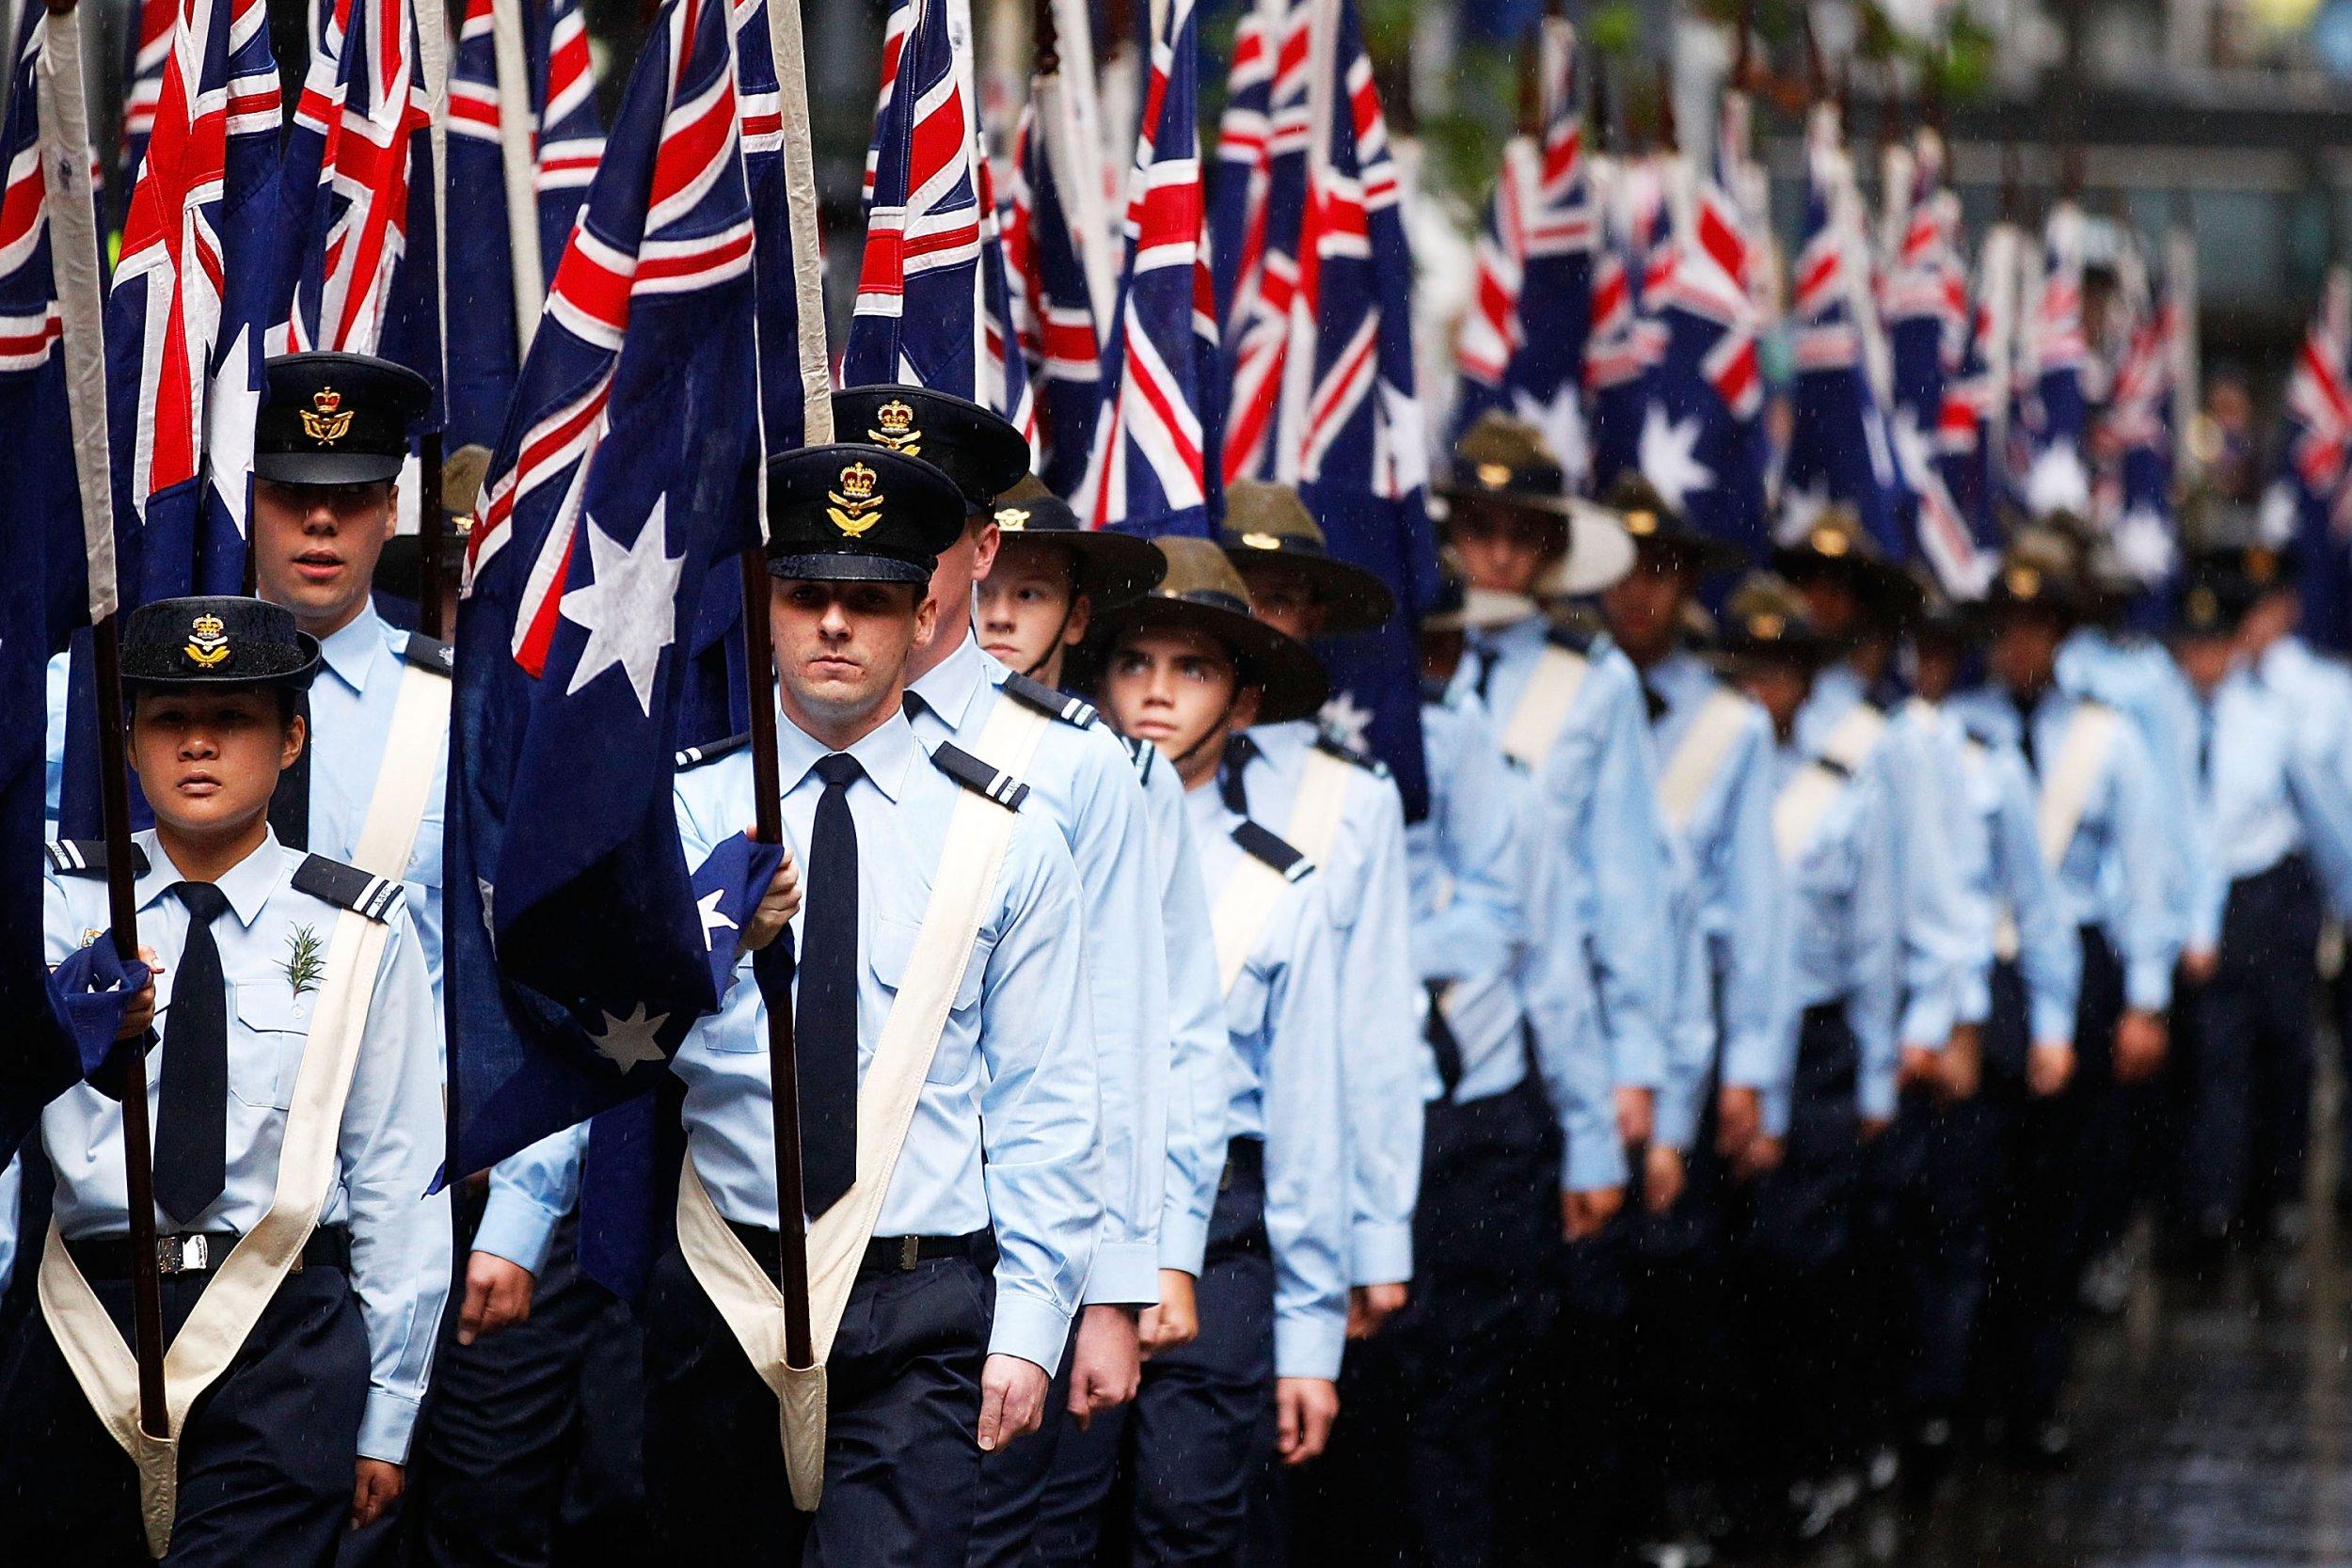 Australia Anzac Day parade